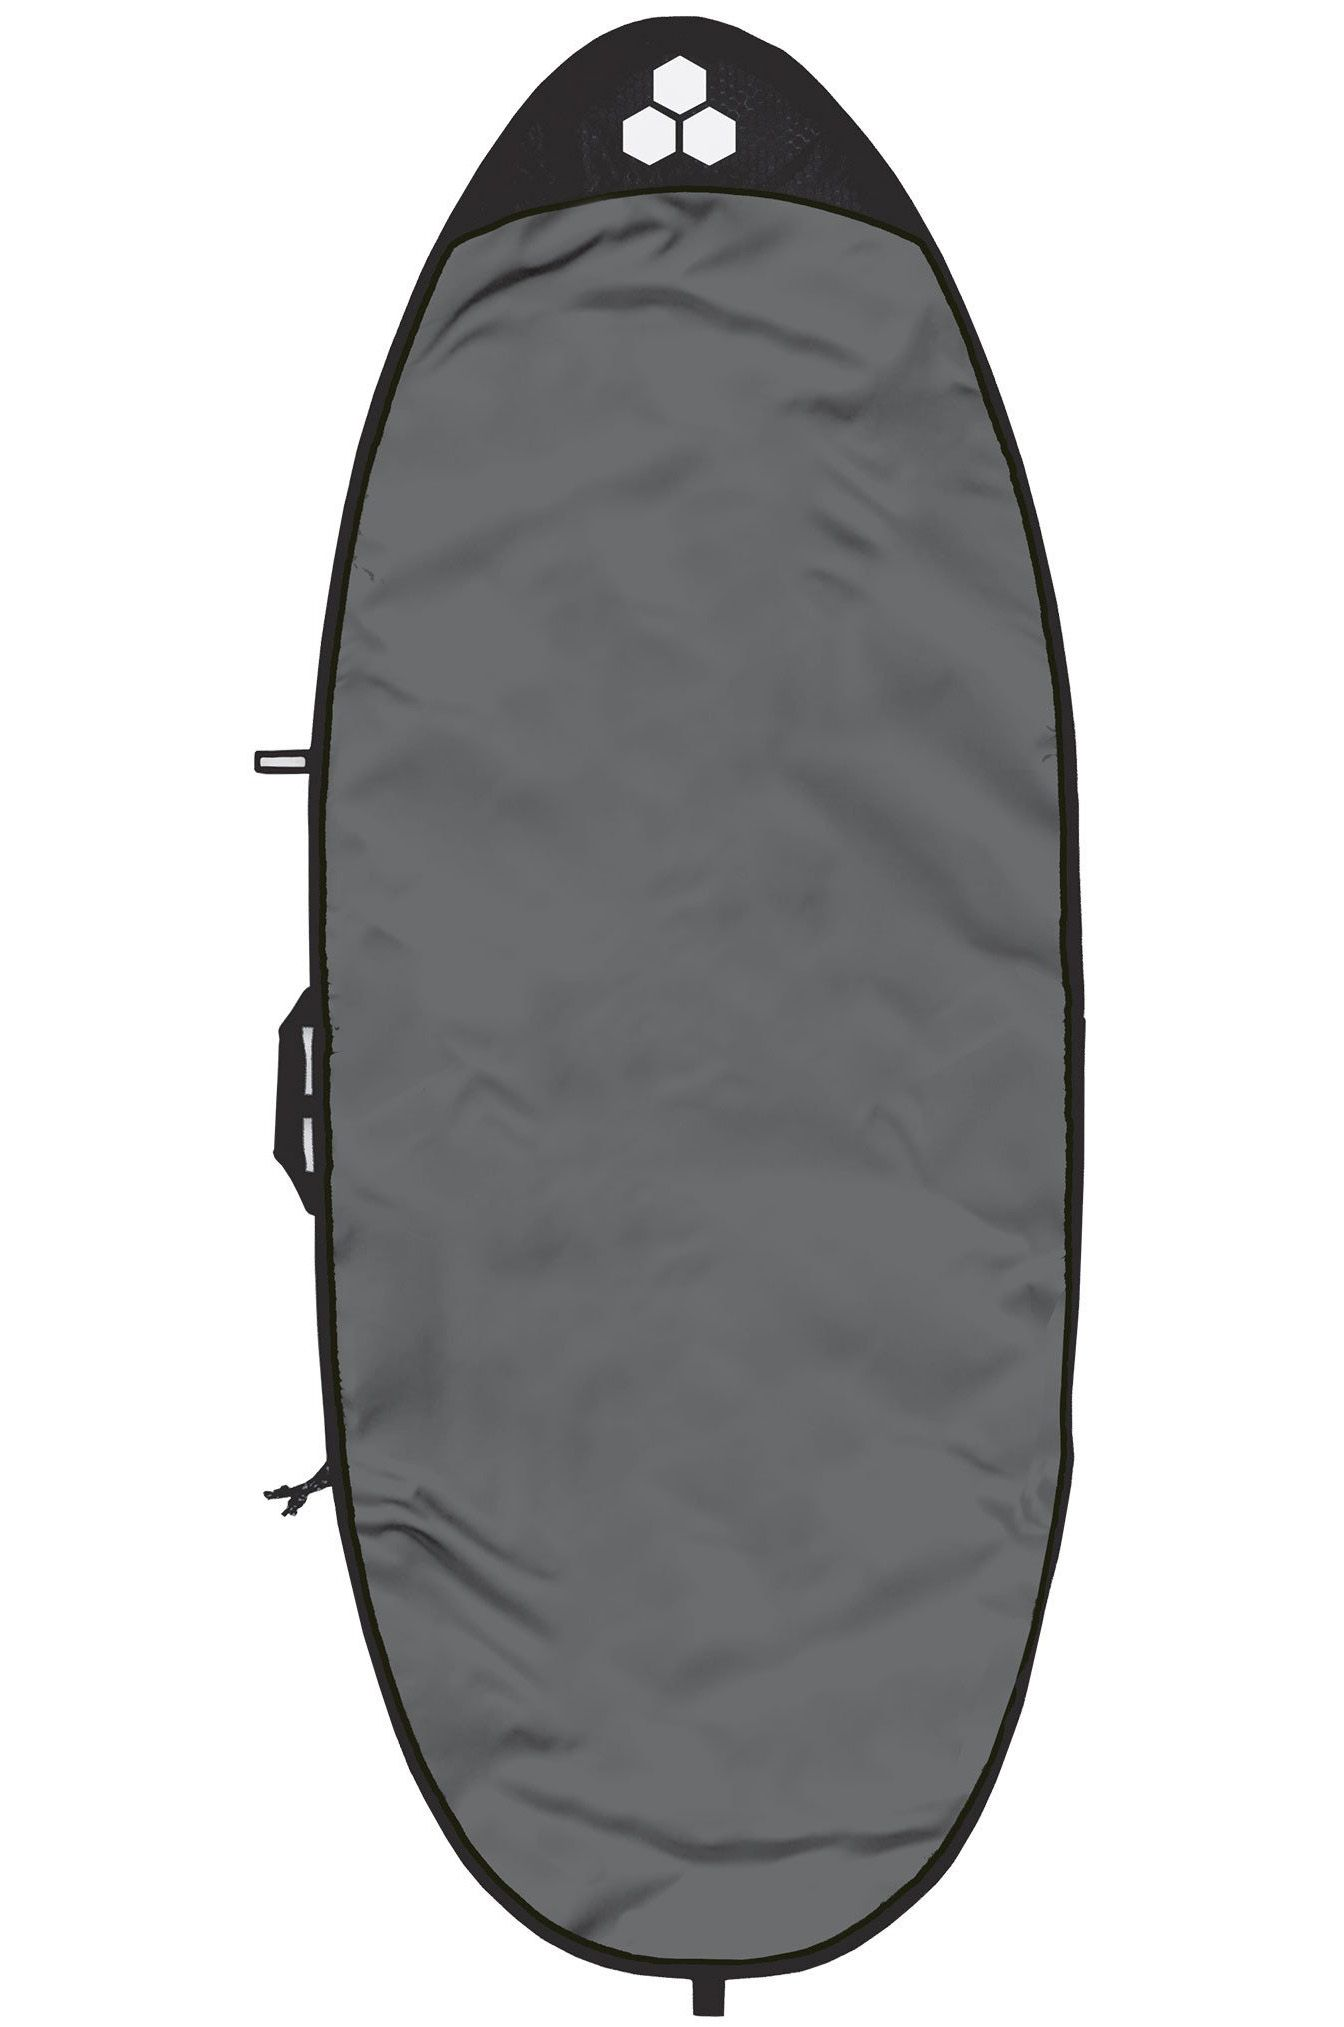 Capa Al Merrick 5'8 FEATHER LITE SPECIALTY BAG Charcoal